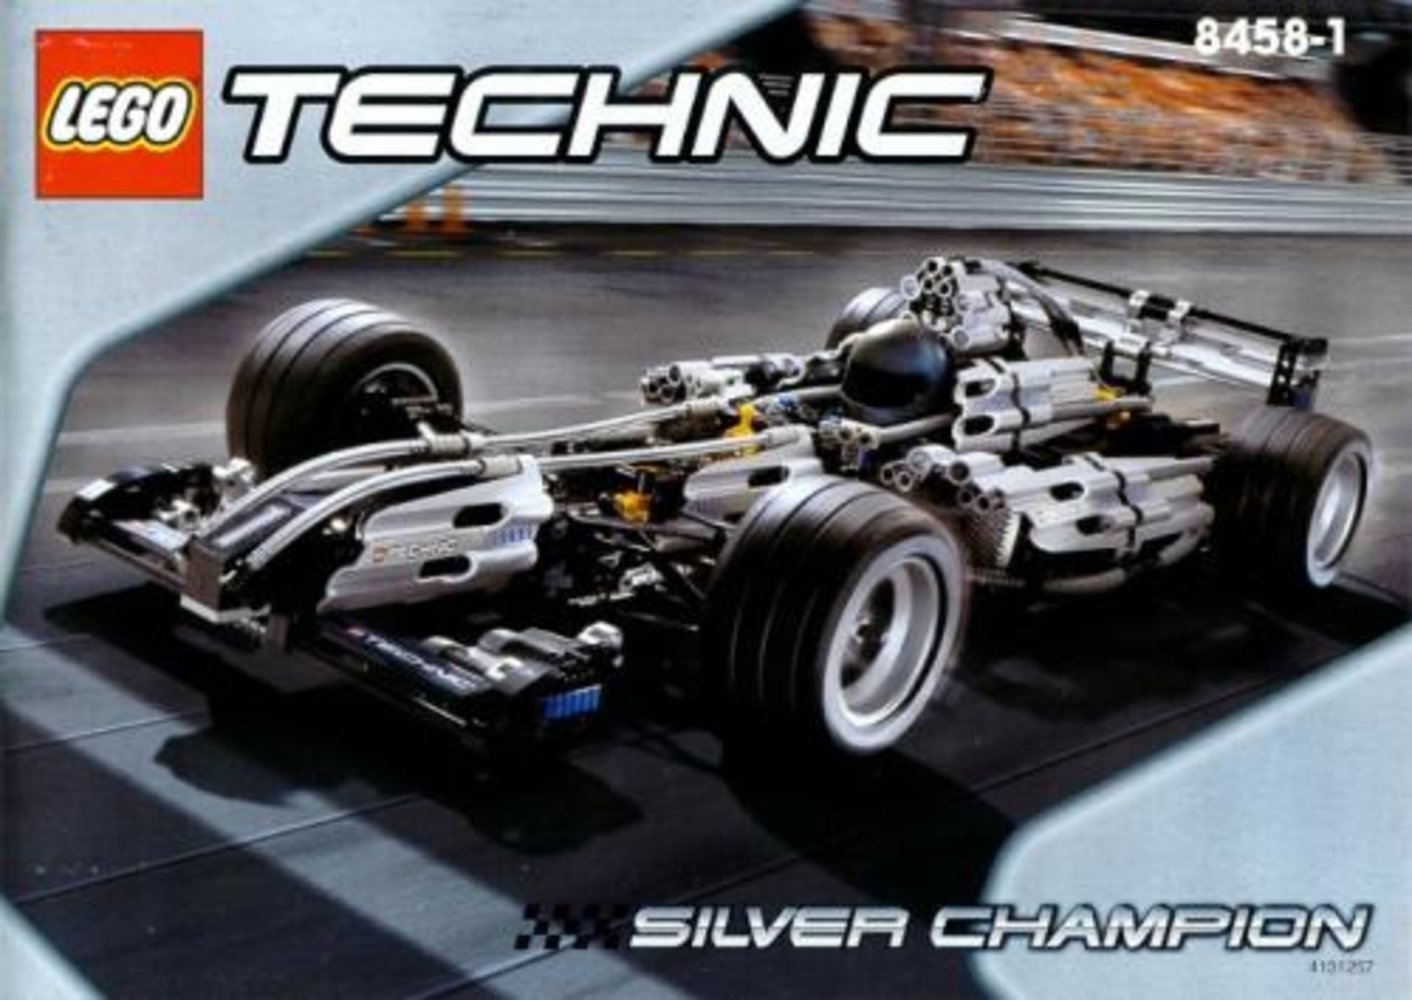 Silver Champion / Formula 1 Racer